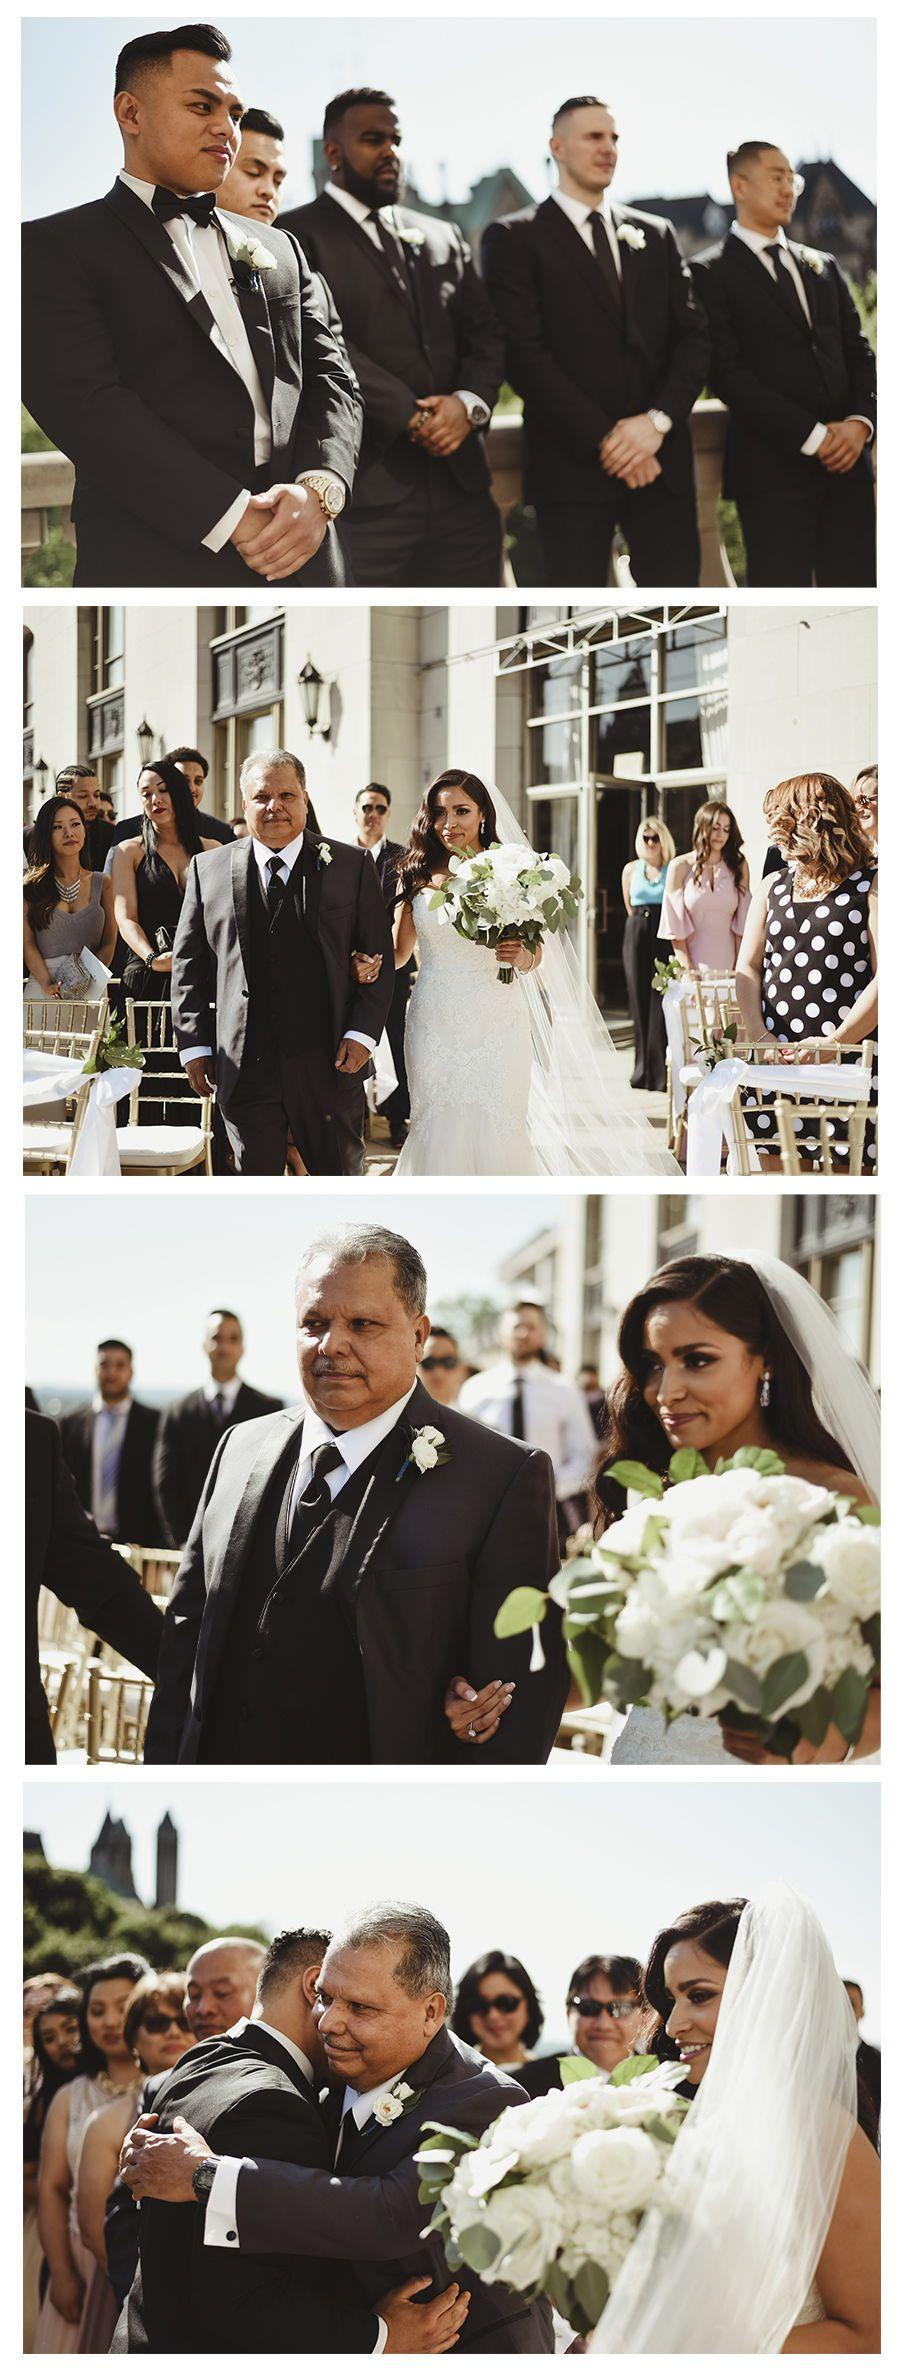 Bride walking down the aisle wedding photo inspiration